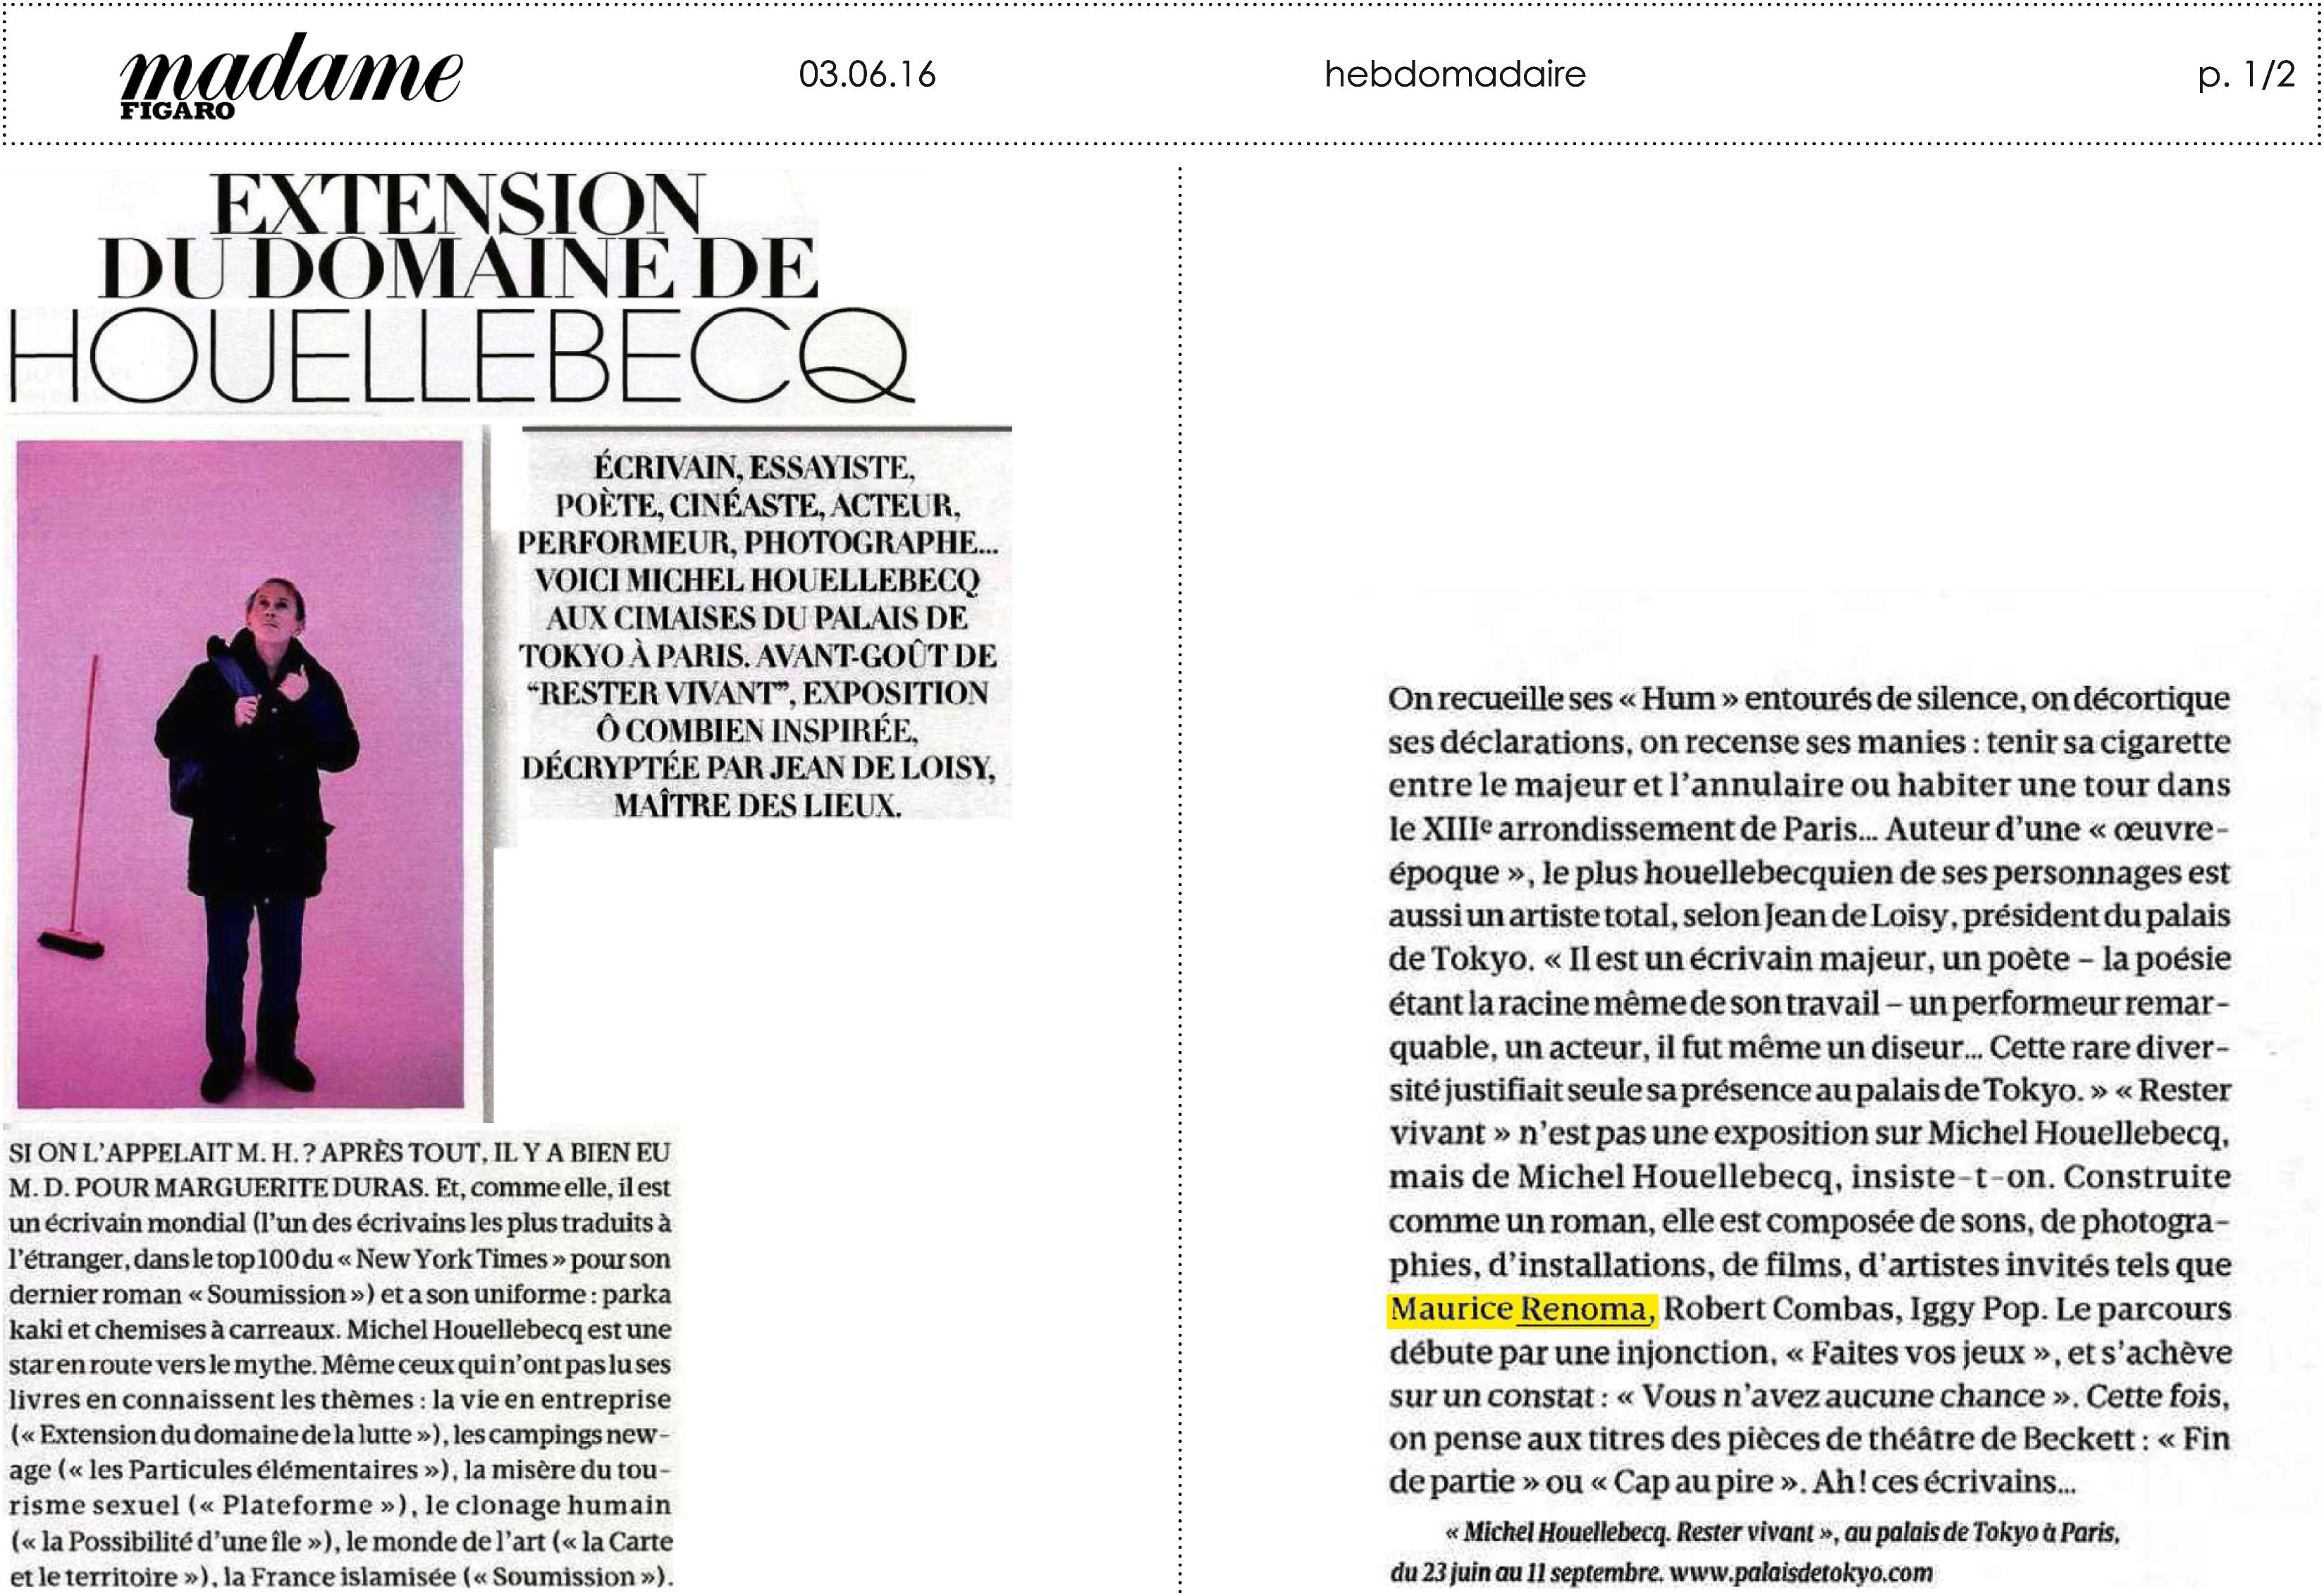 03.06.16 _ Madame Figaro